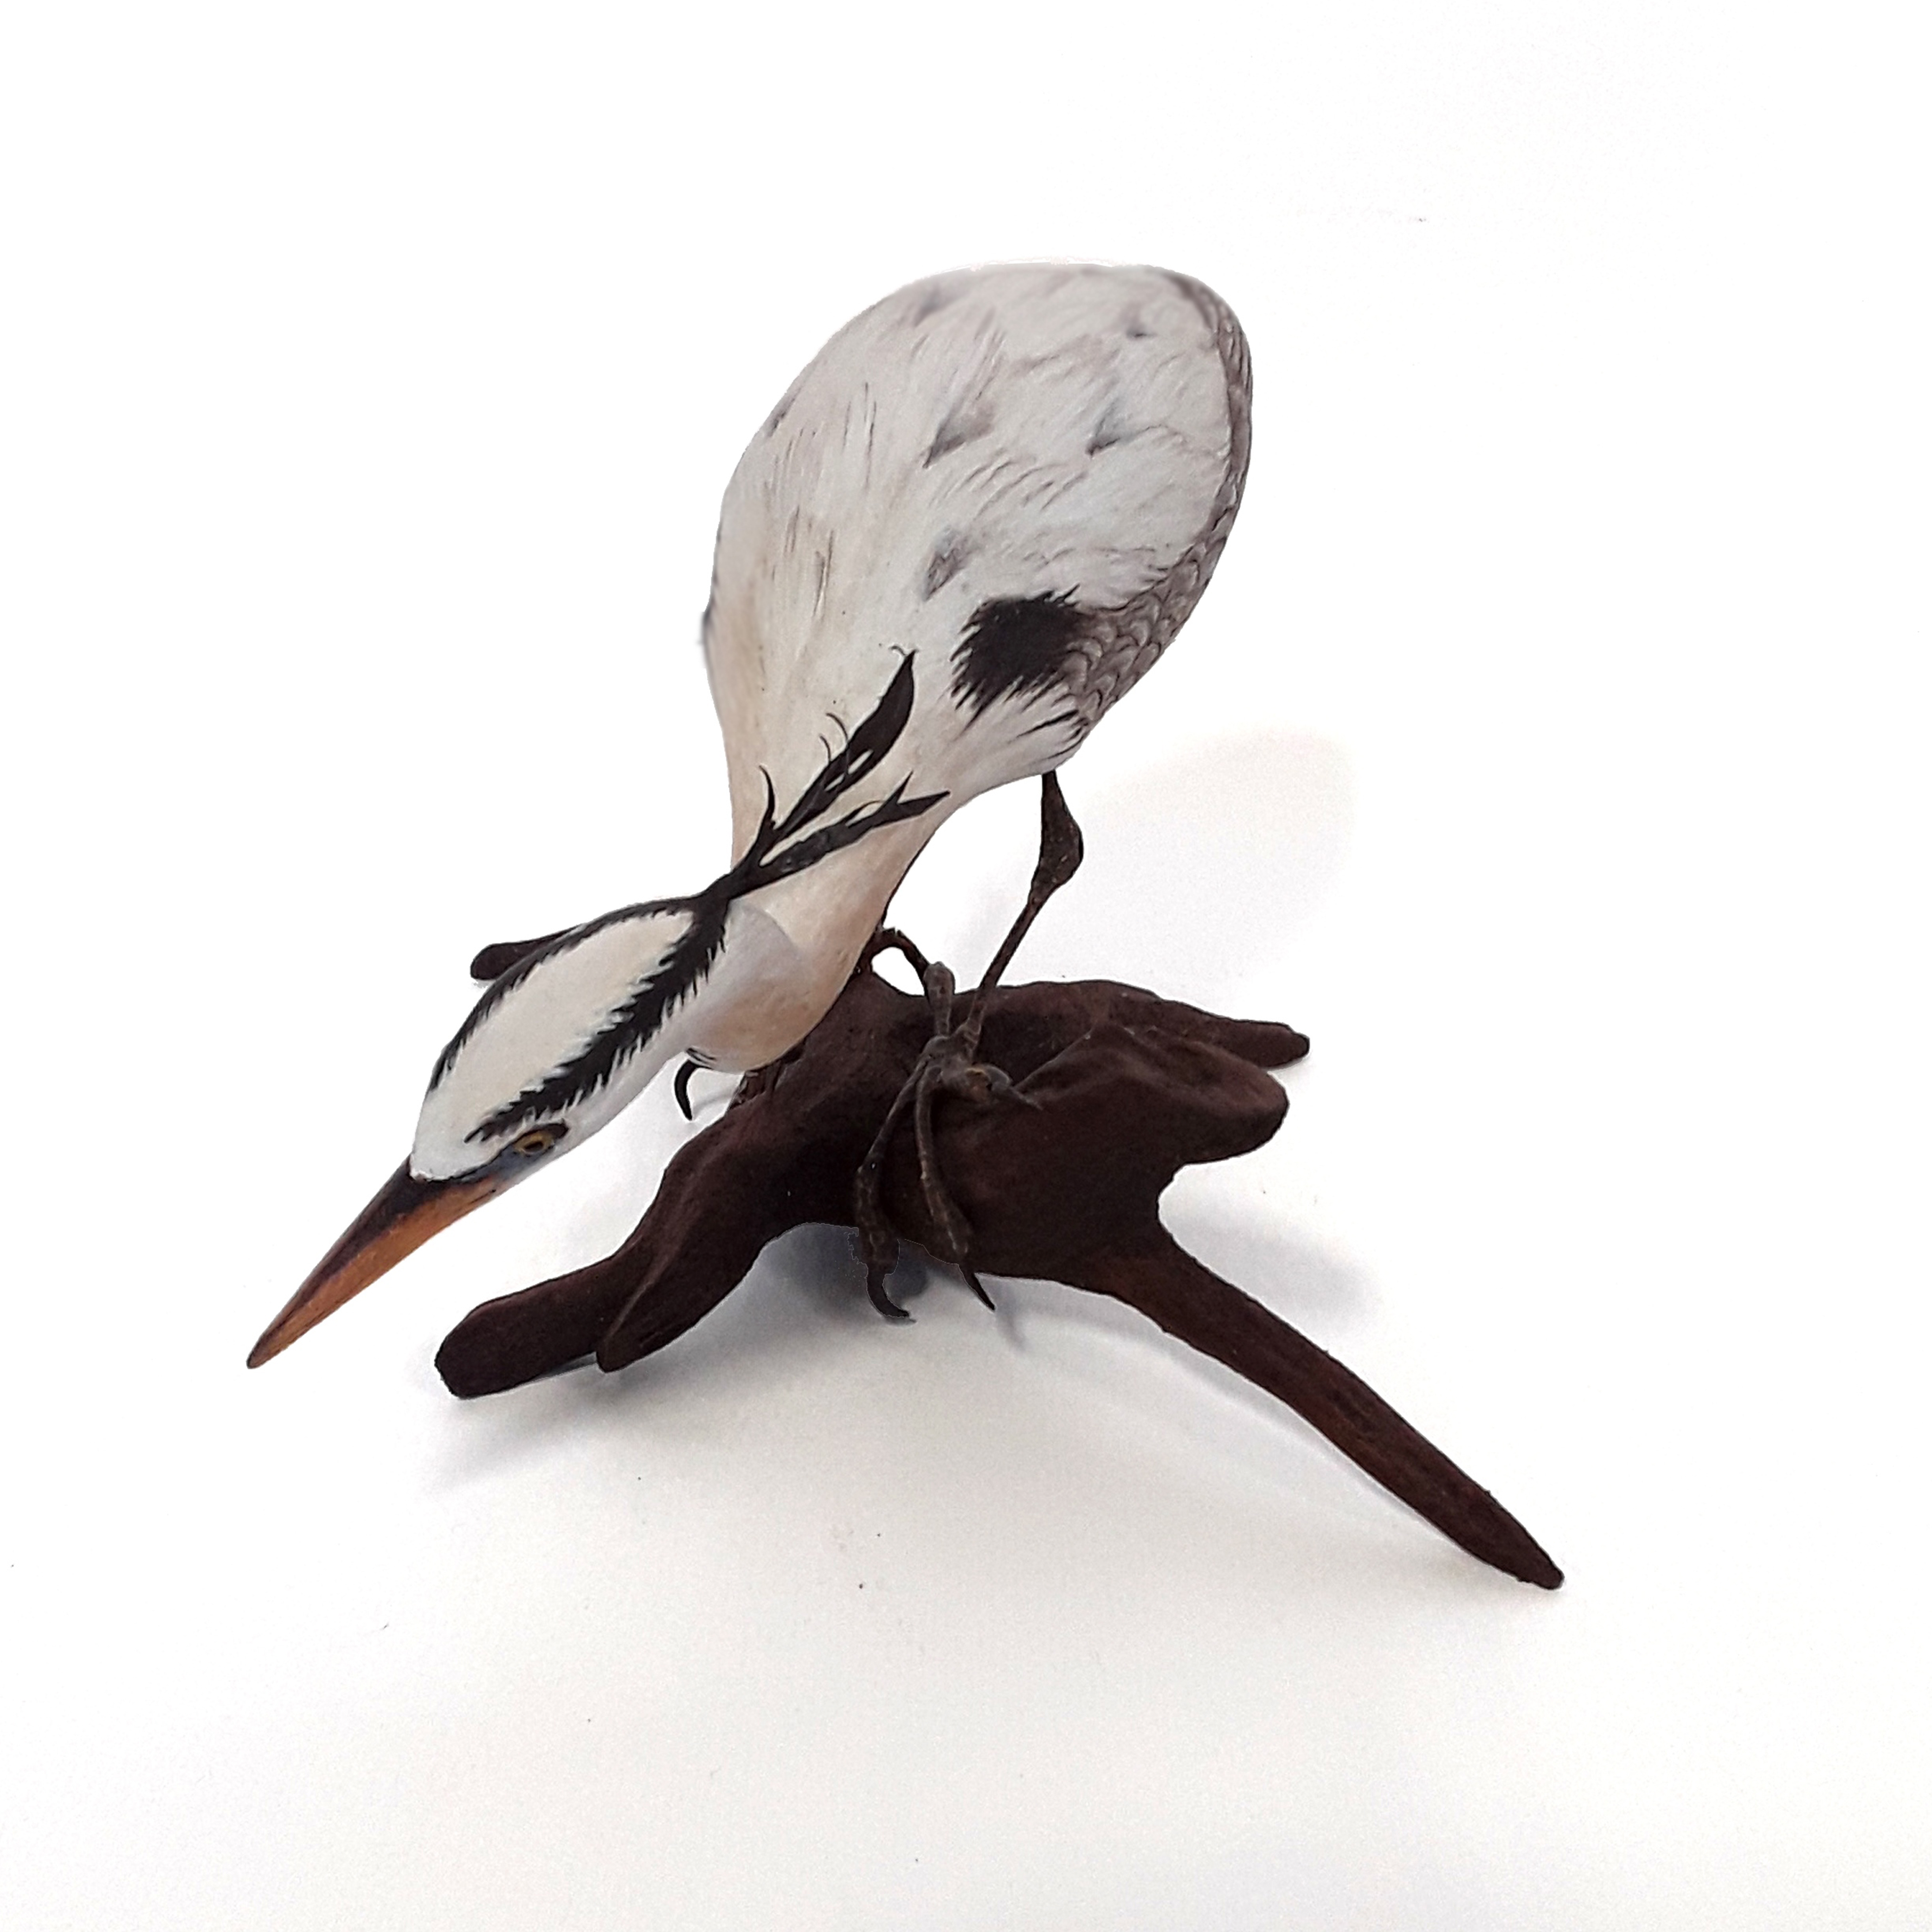 Tony Bendig's Small Herron Carving